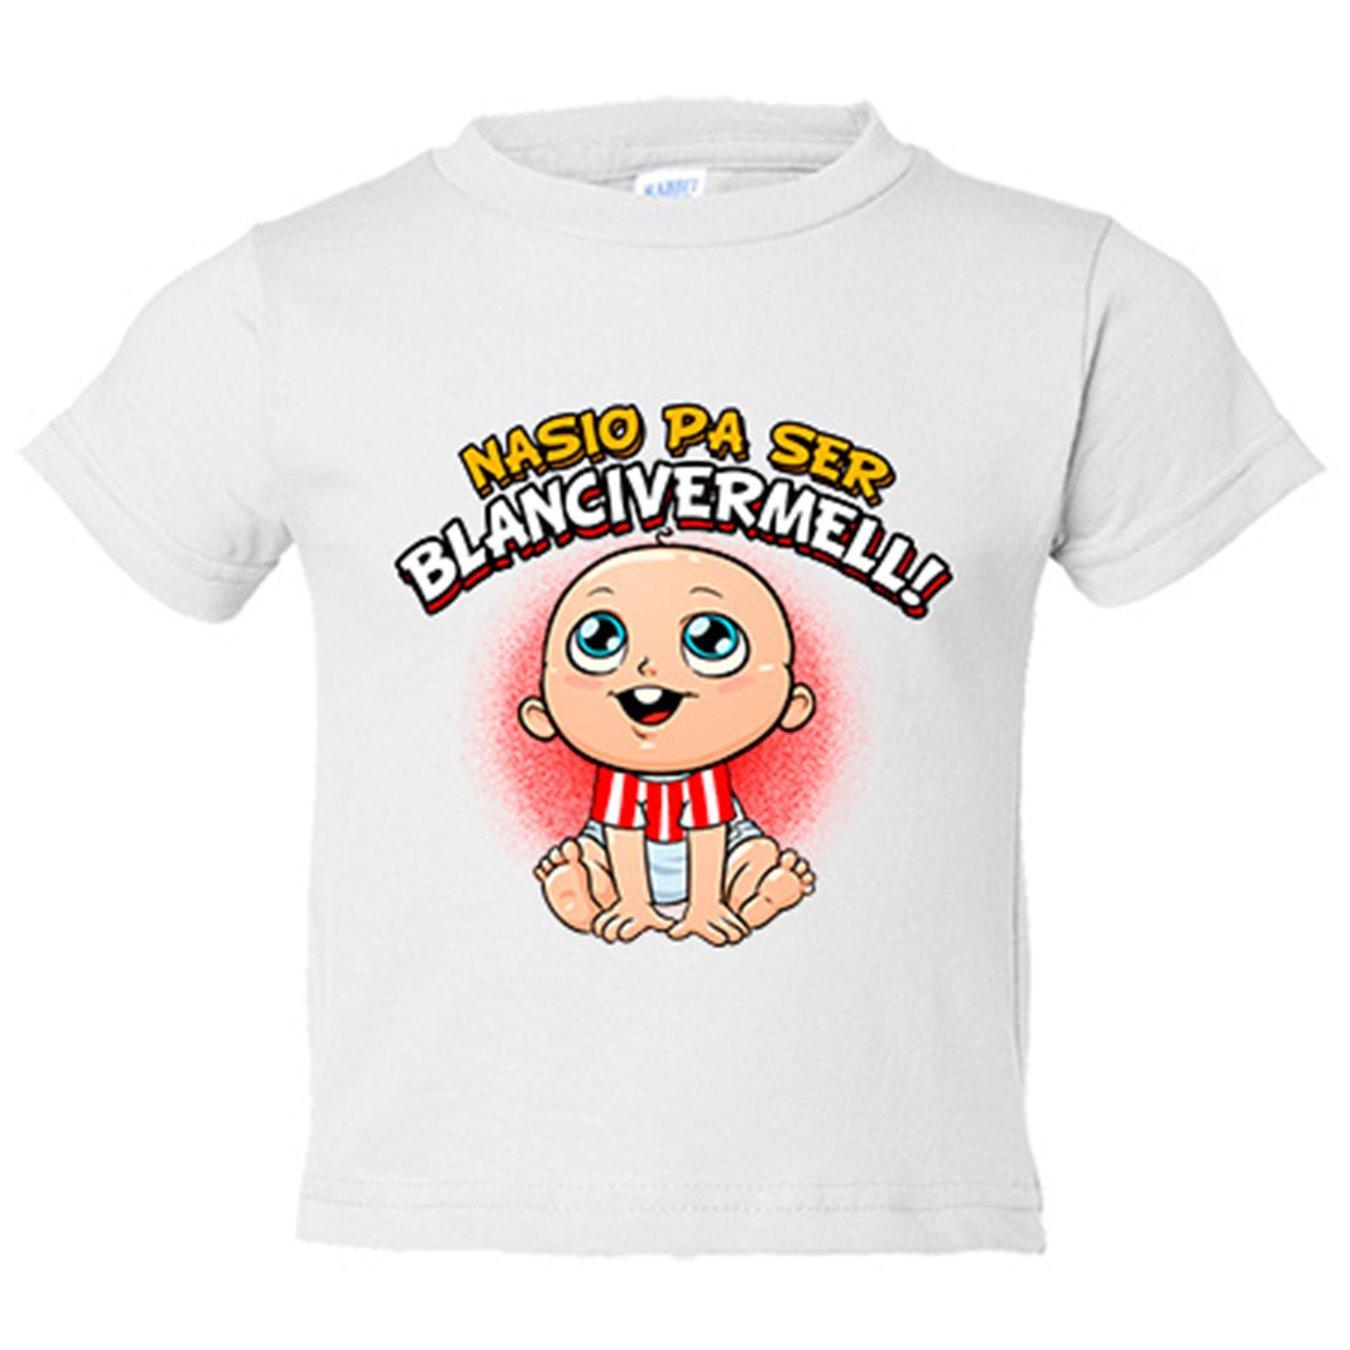 Camiseta niño nacido para ser Blanc i Vermell Girona fútbol - Amarillo, 3-4 años: Amazon.es: Bebé